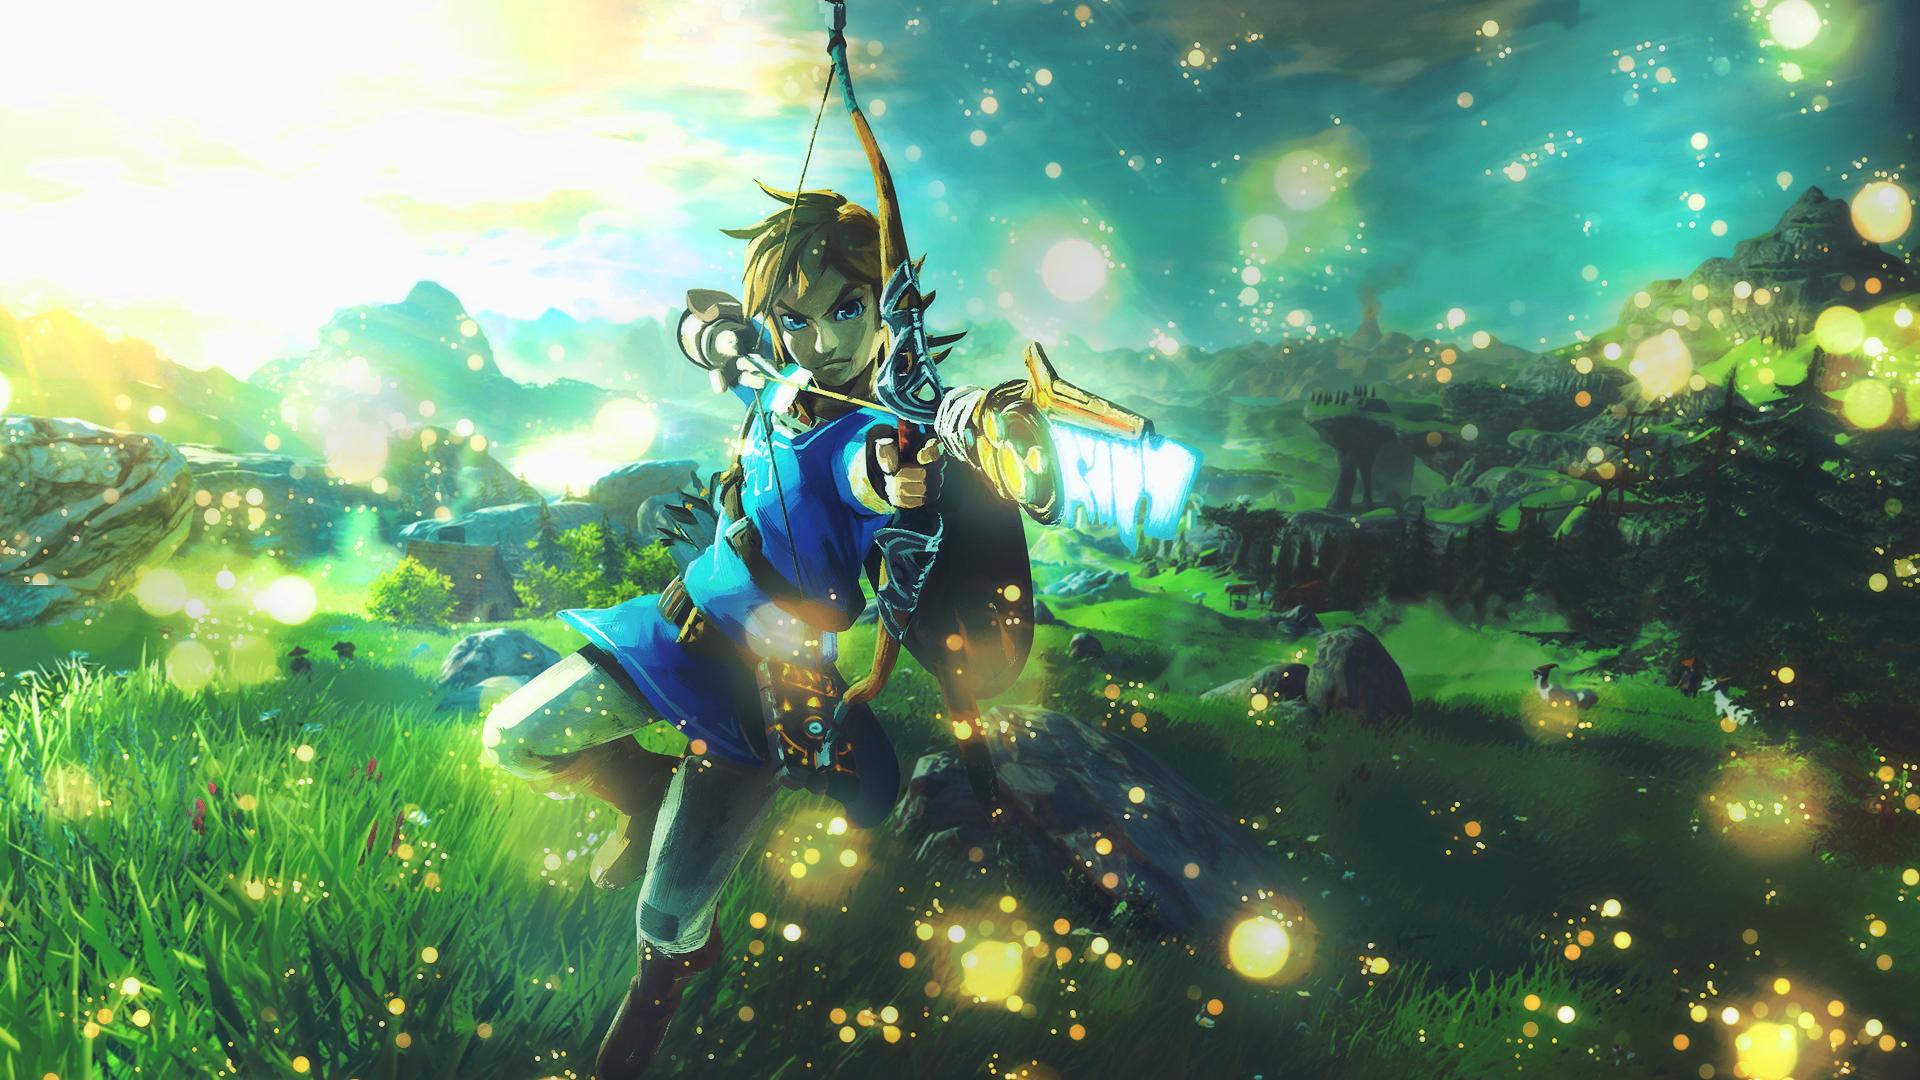 Zelda: Breath of the Wild [Wallpaper] by YataMirror on ...